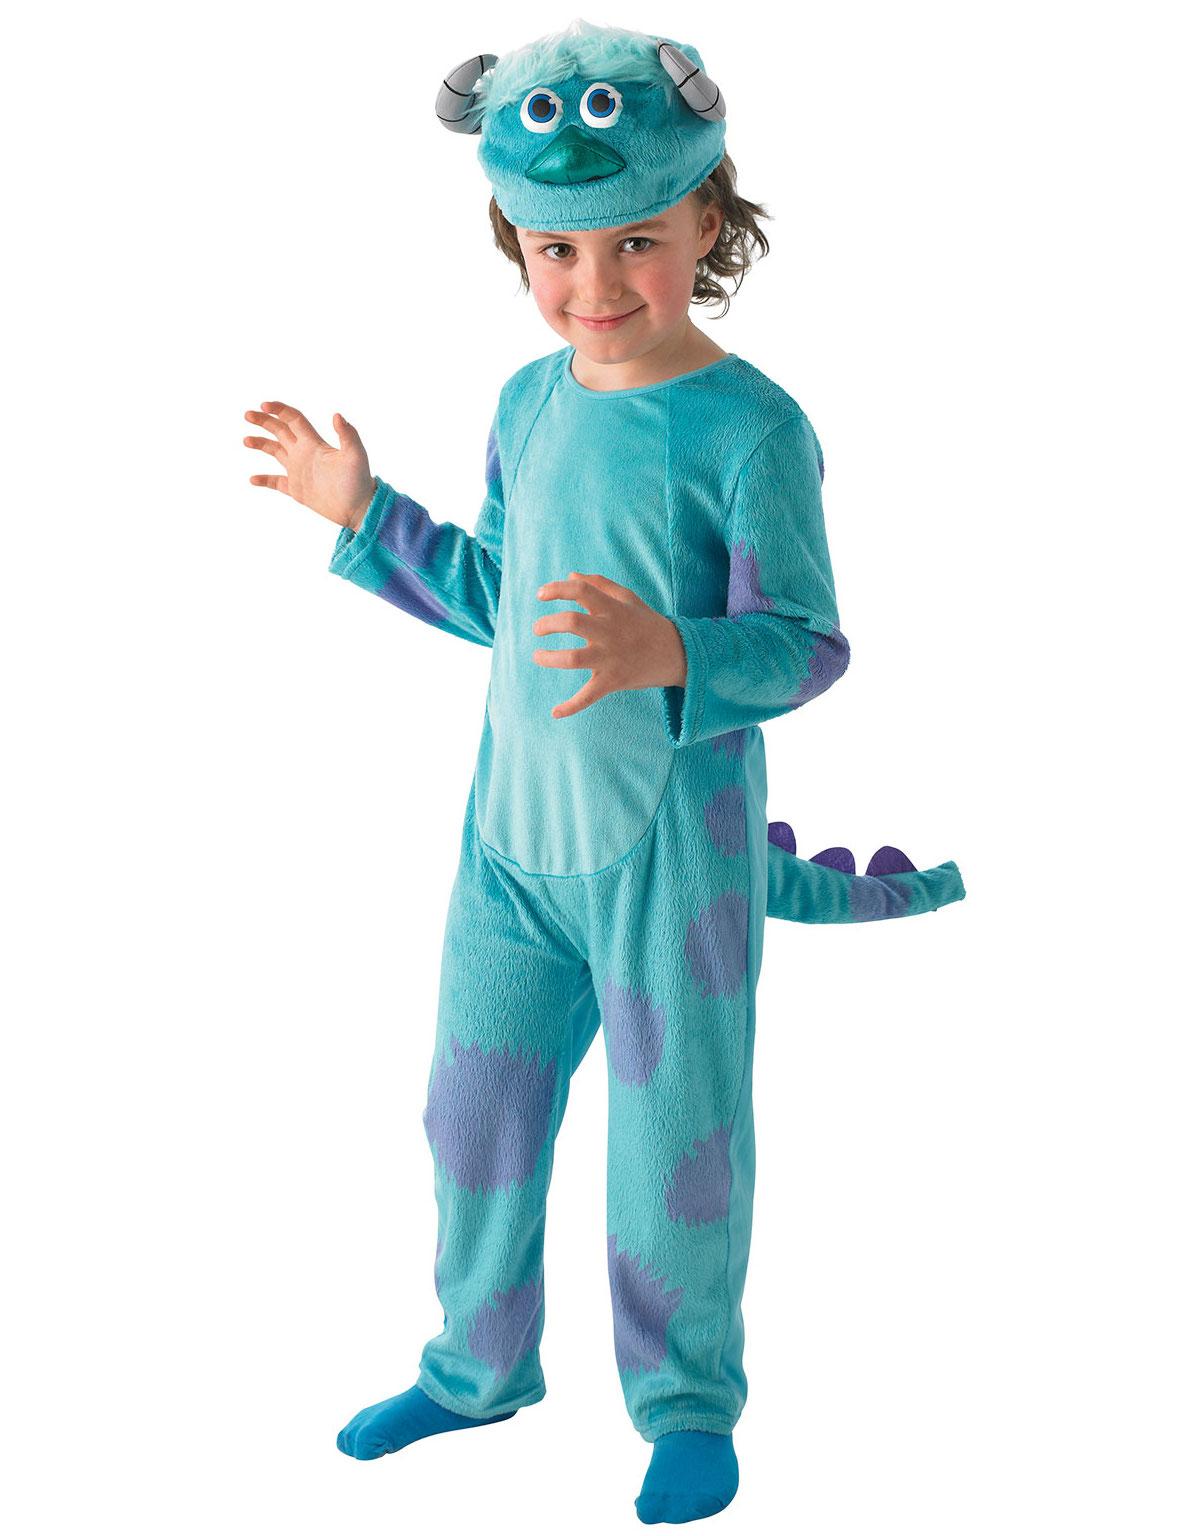 Monster Uni Kostum.Die Monster Uni Sulley Deluxe Kinder Kostum Lizenzware Blau Lila Gunstige Faschings Kostume Bei Karneval Megastore